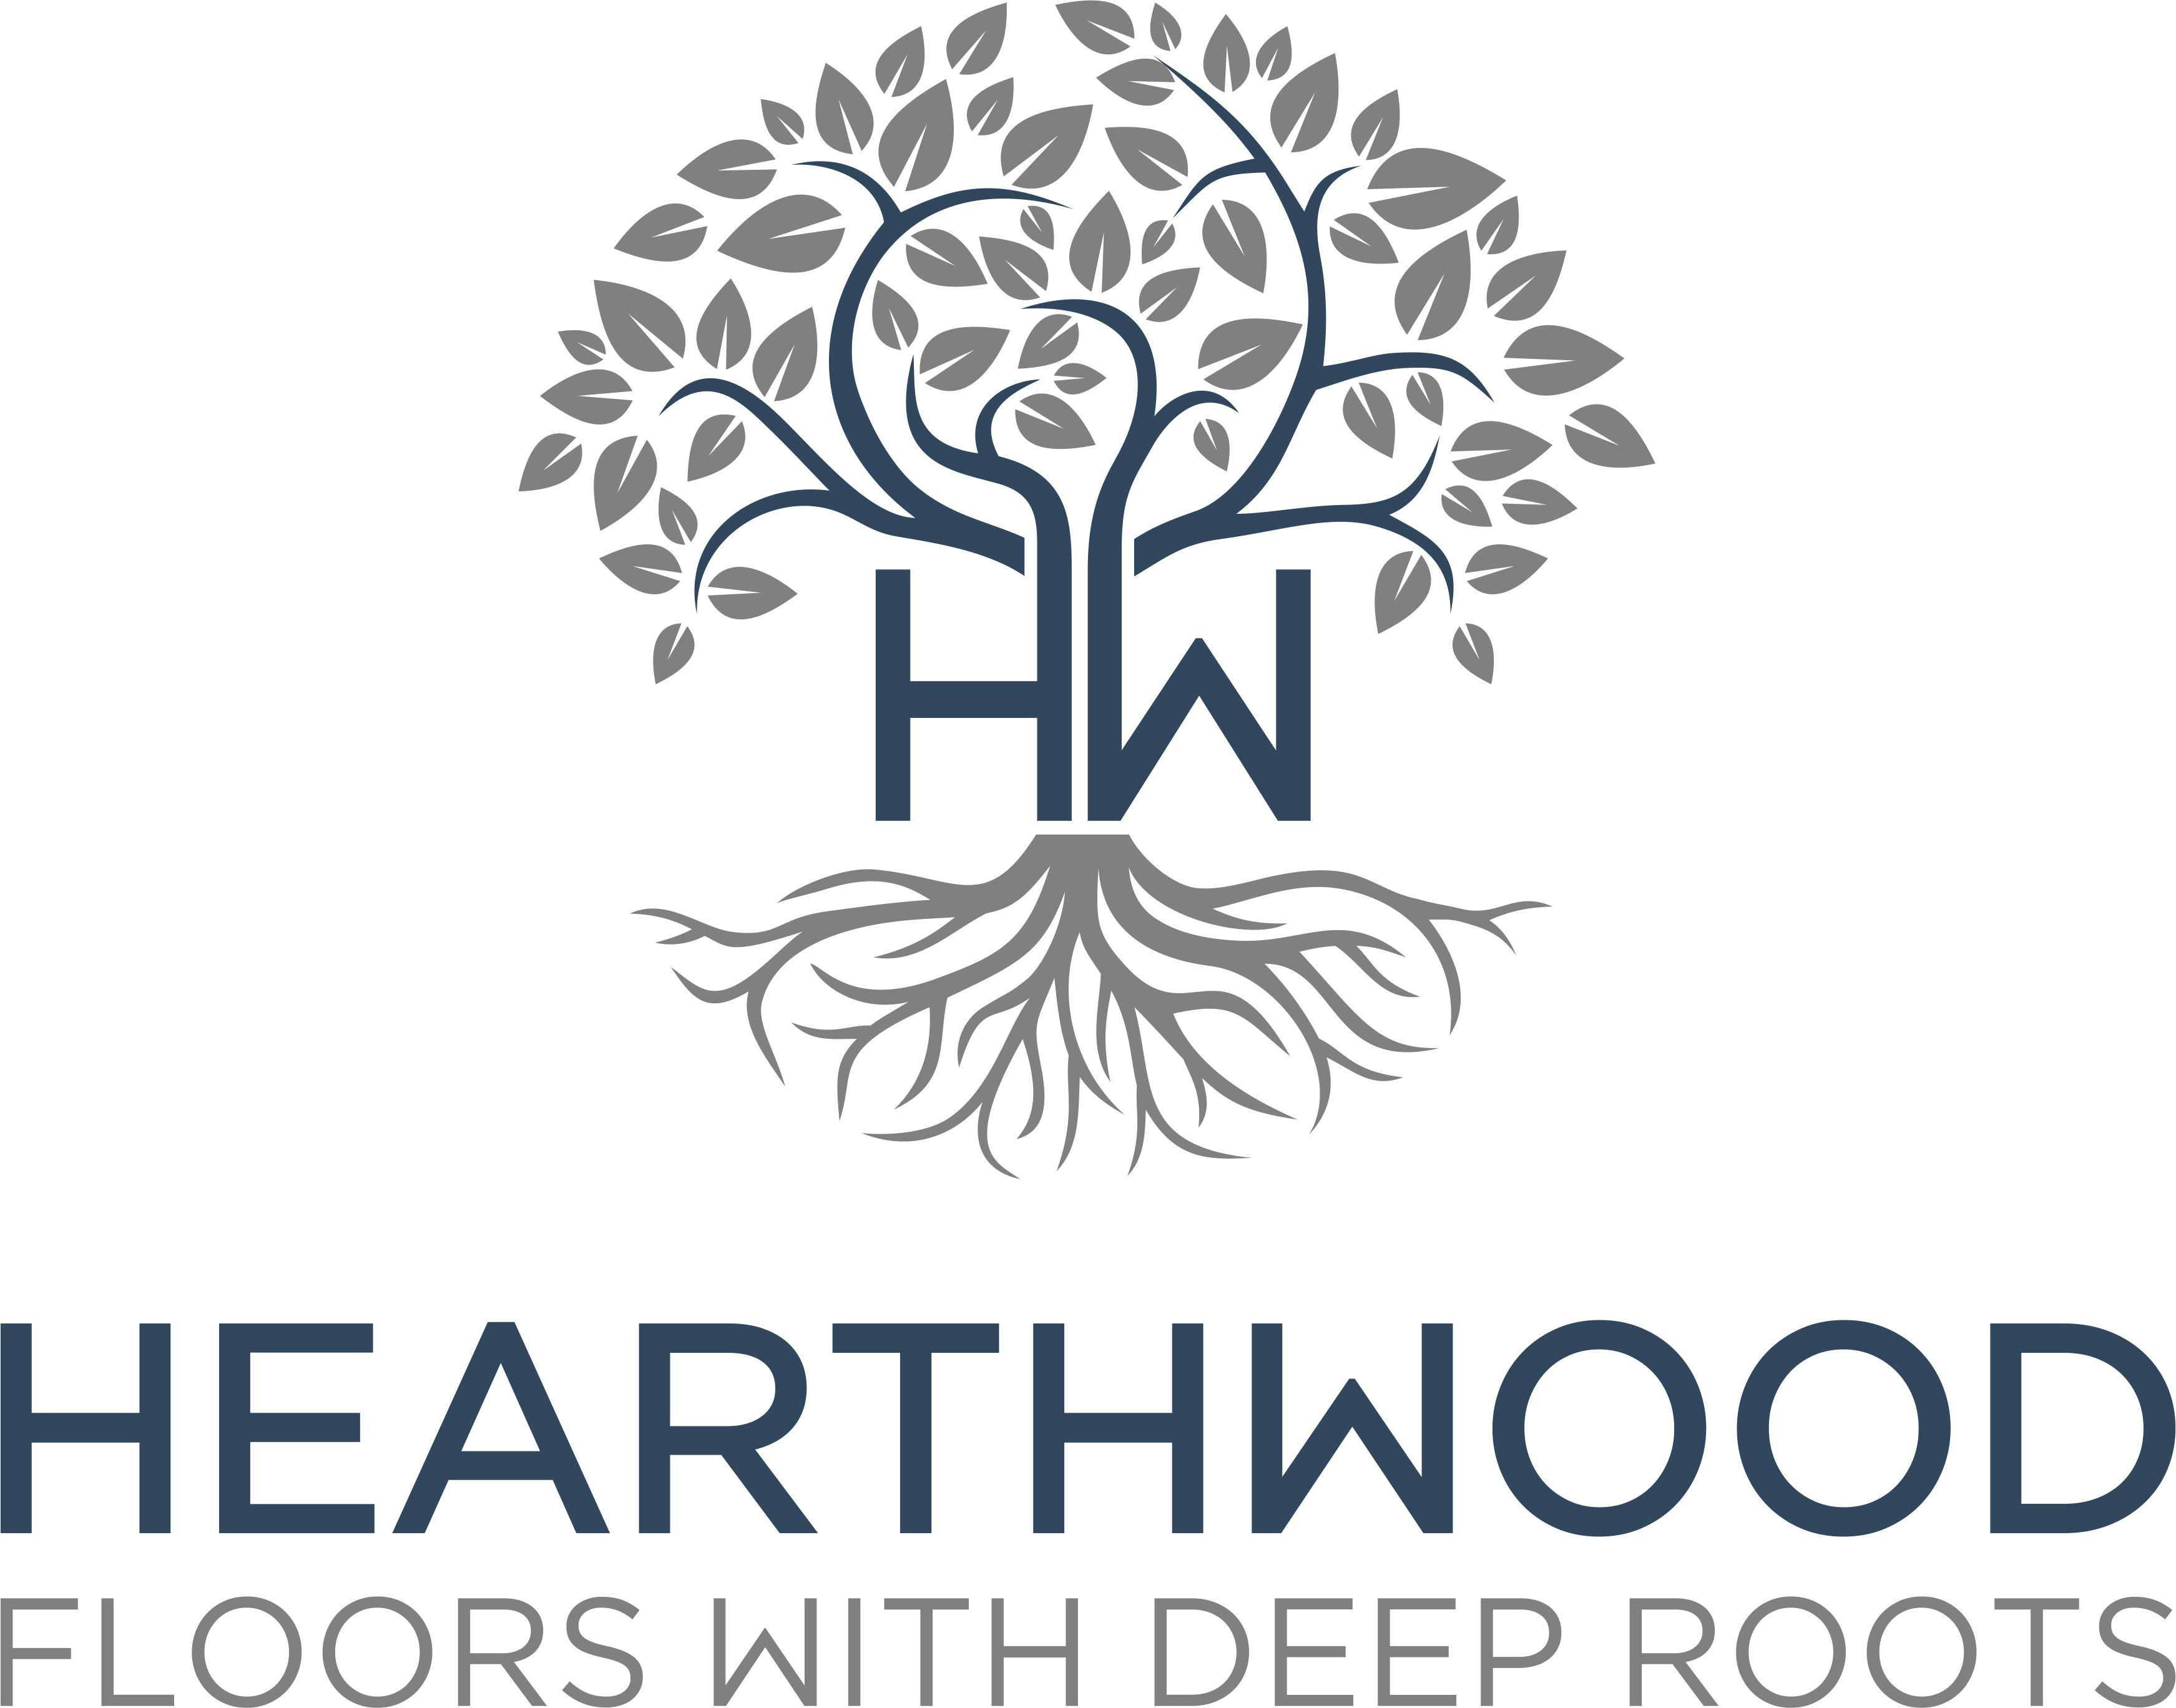 """Hearthwood - floors with deep roots"": Hardwood Flooring Consumer Brand"